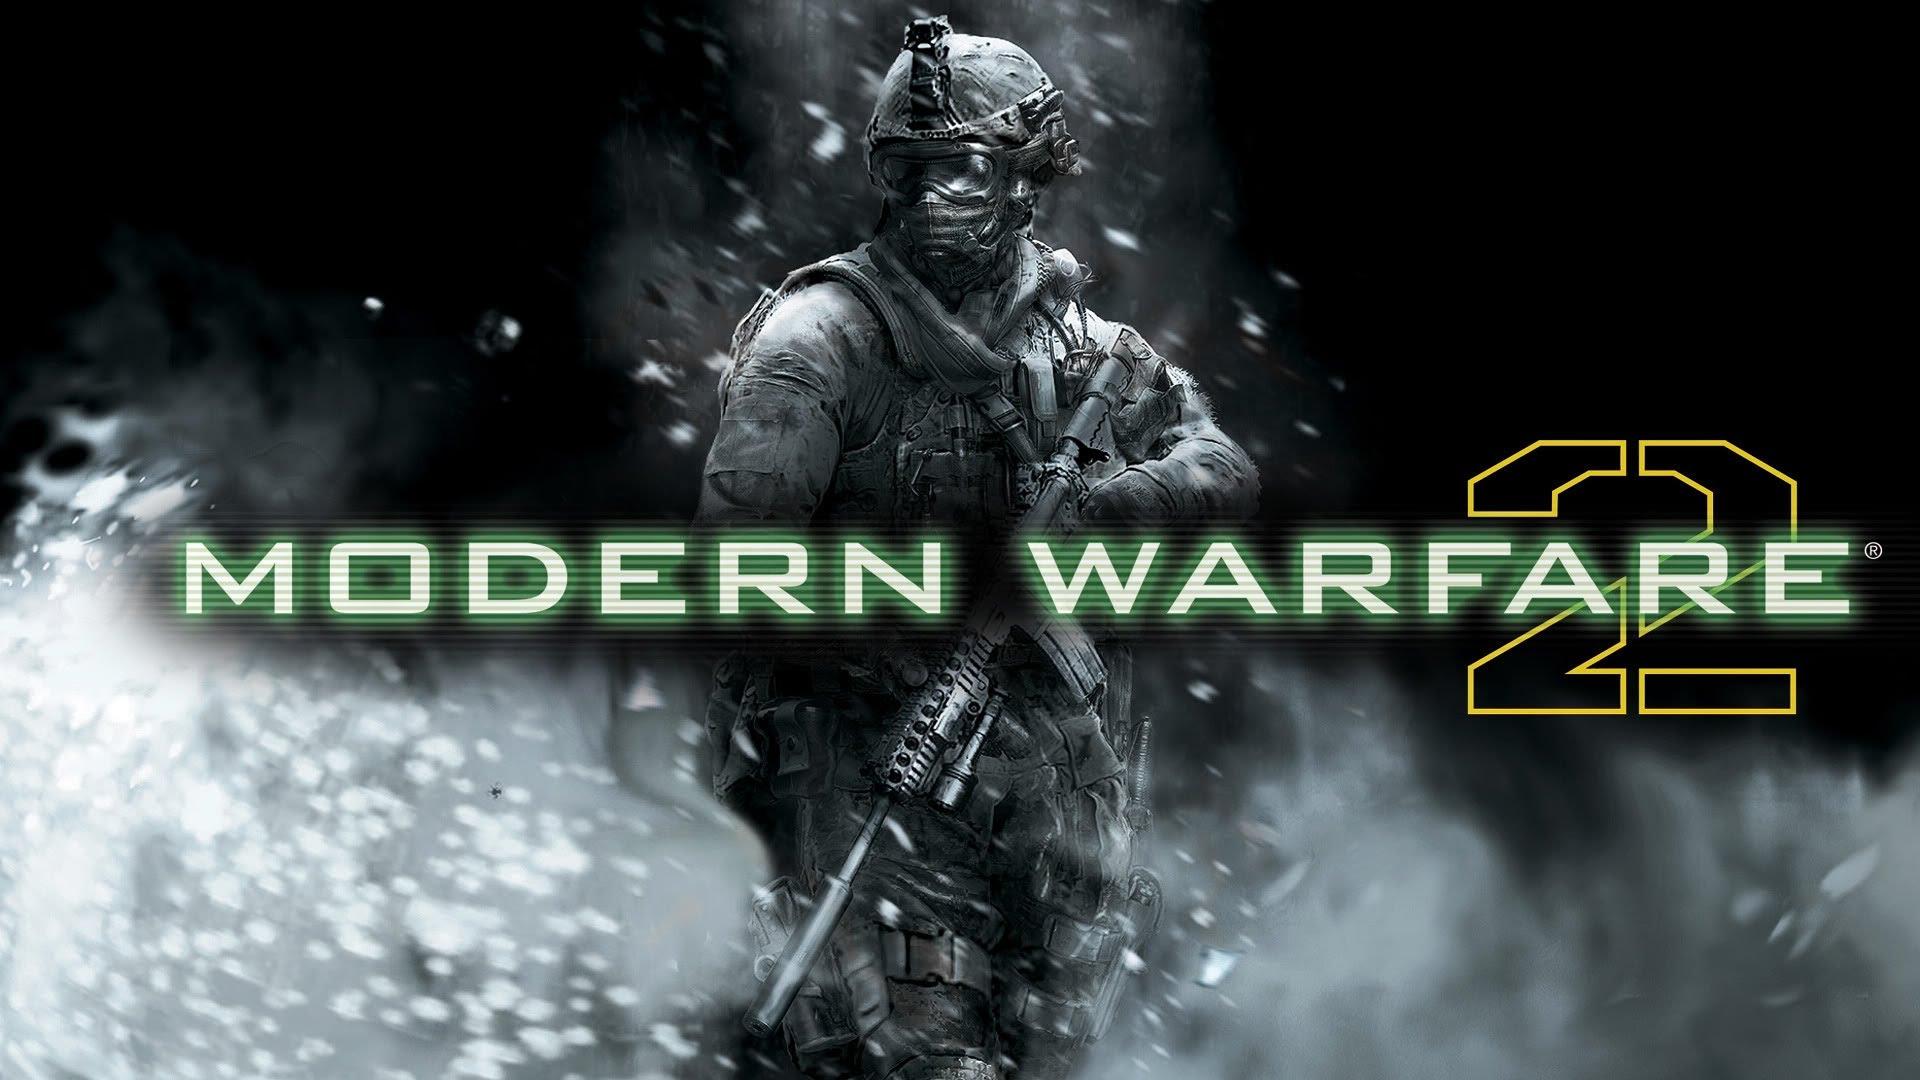 call of duty modern warfare 3 full game nosteam